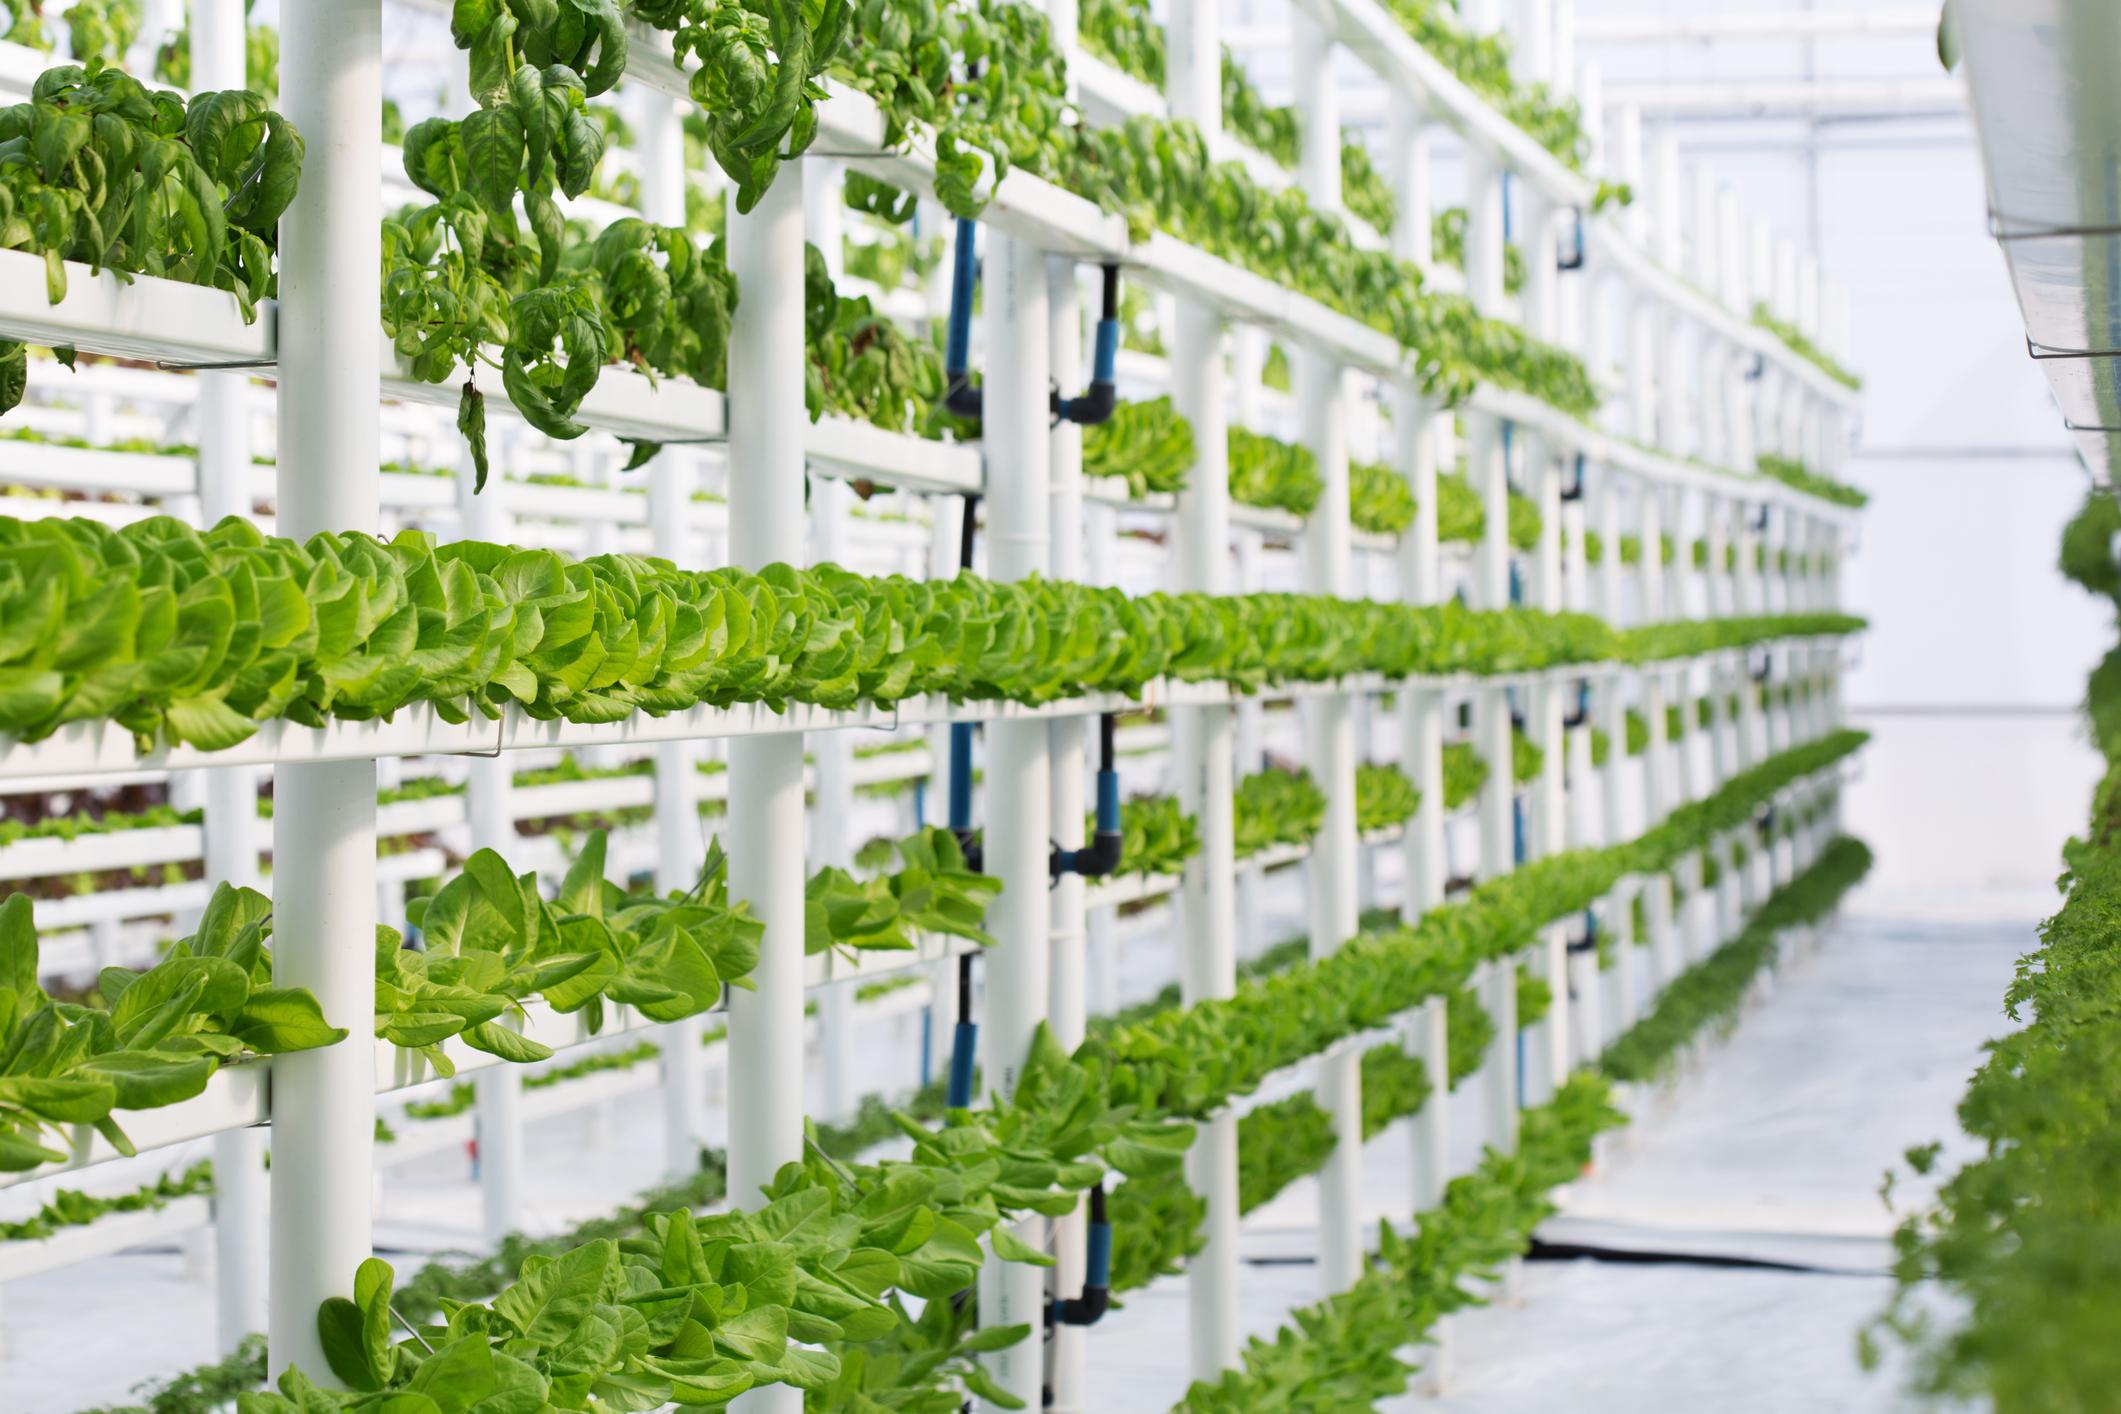 Vertical Gardens in a Greenhouse - Garden & Greenhouse